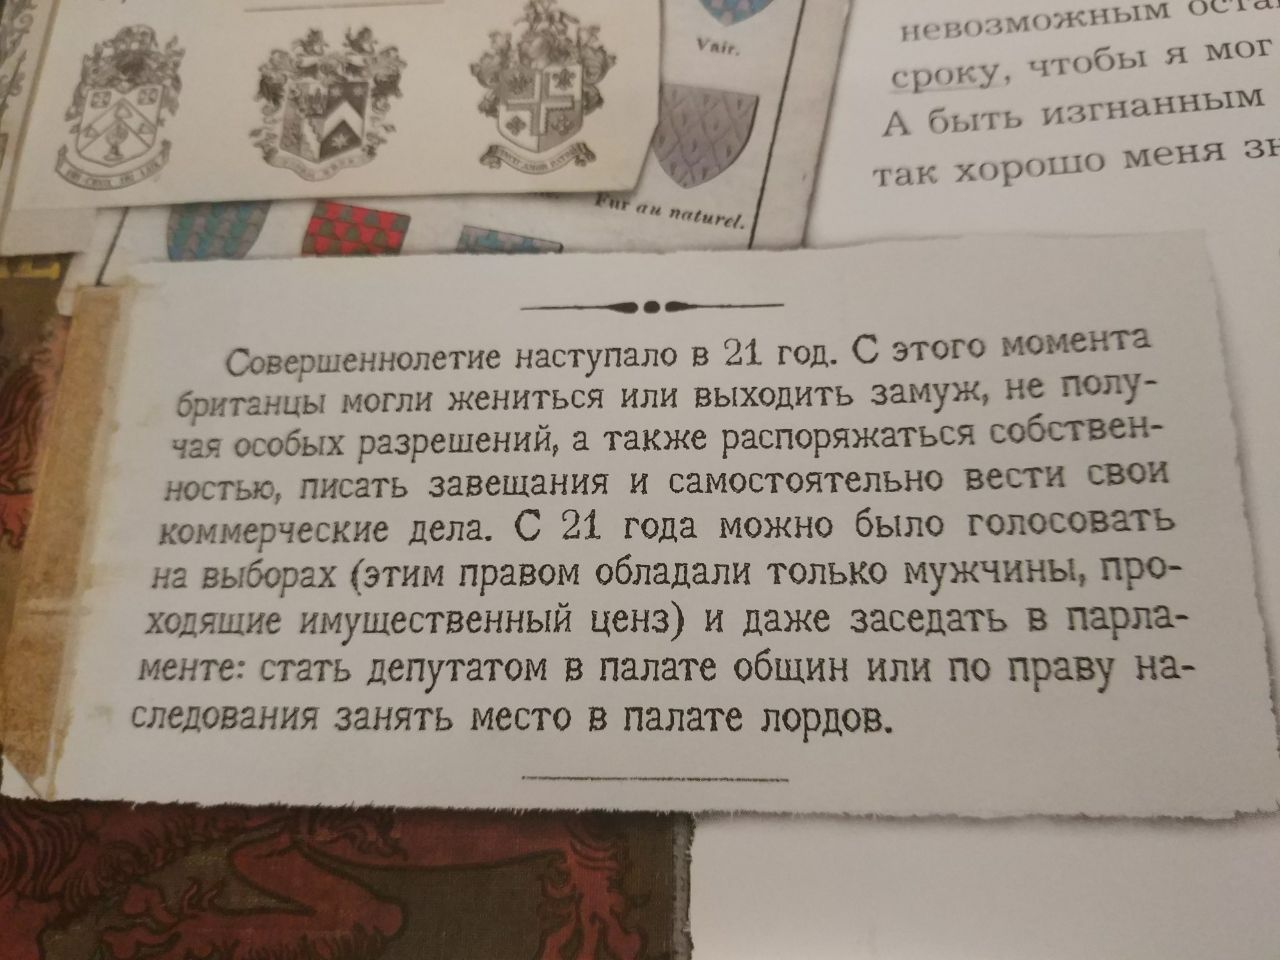 http://s9.uploads.ru/6lzng.jpg